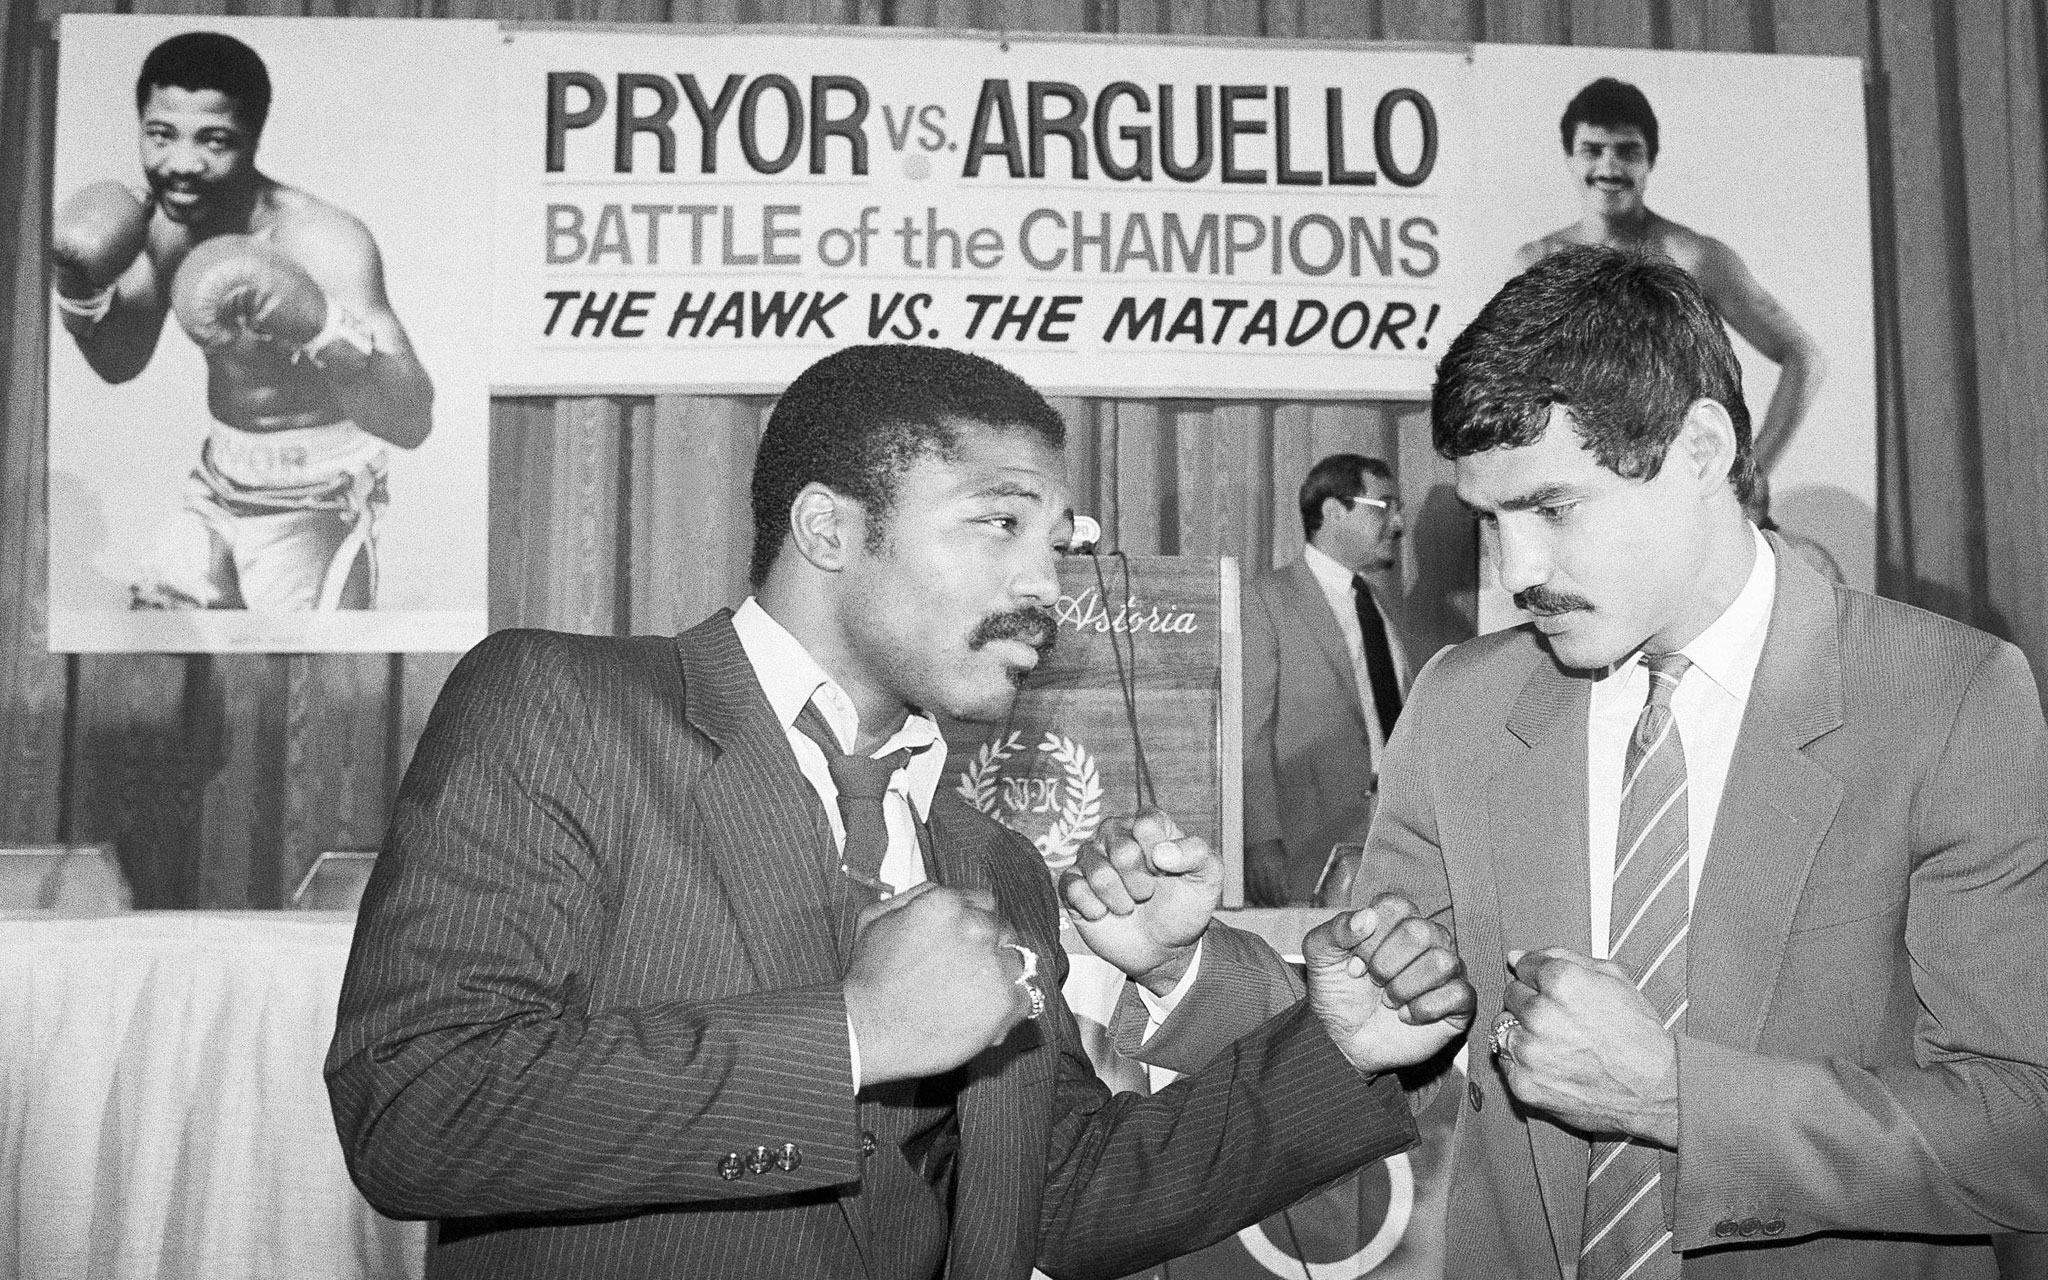 Aaron Pryor vs. Alexis Arguello Photo courtesy of ESPN - David vs. Goliath: A boxing history lesson